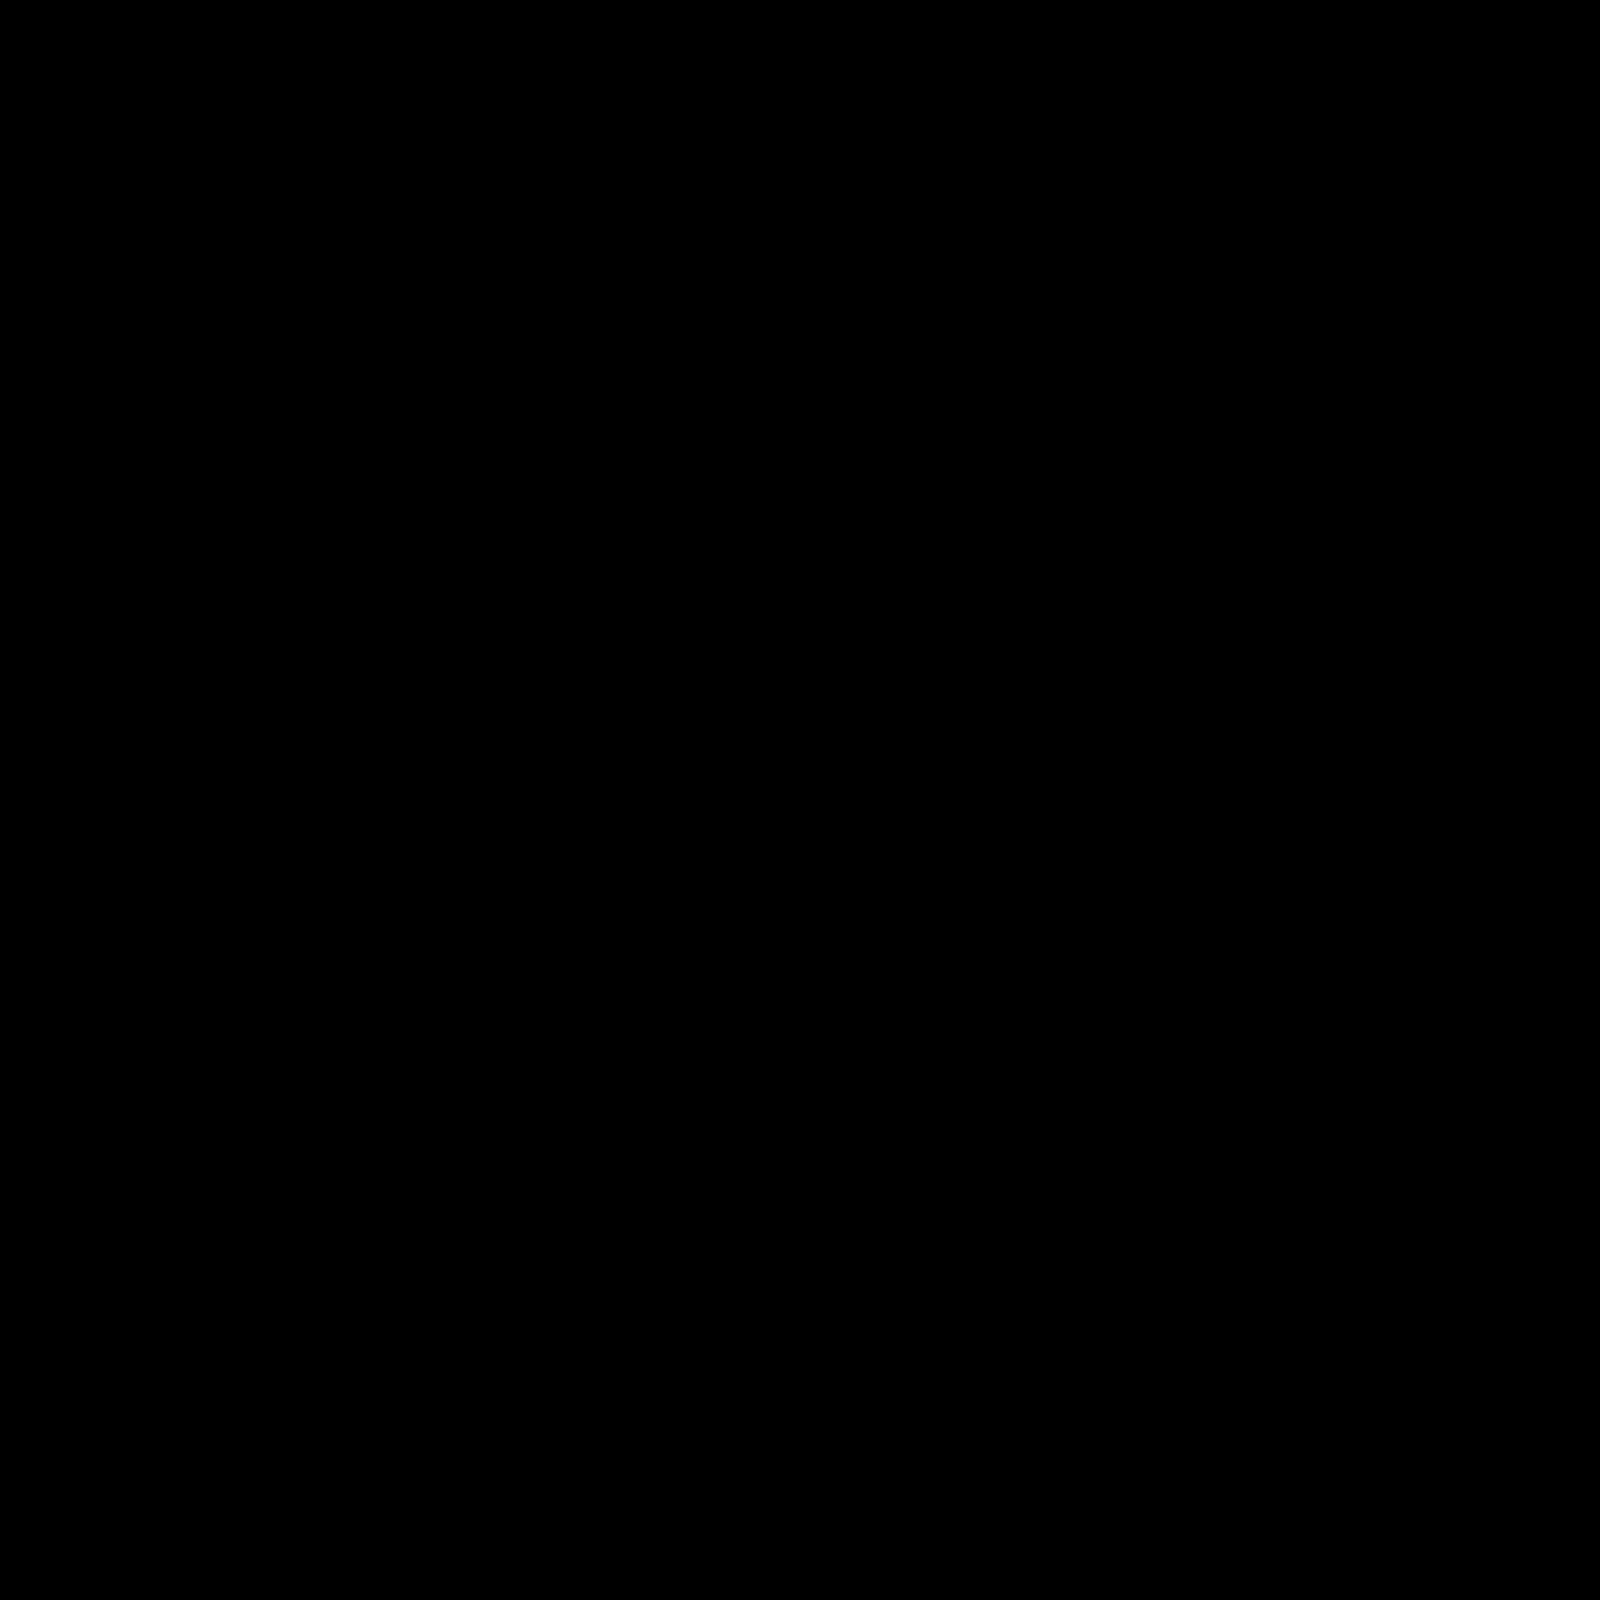 2004 icon